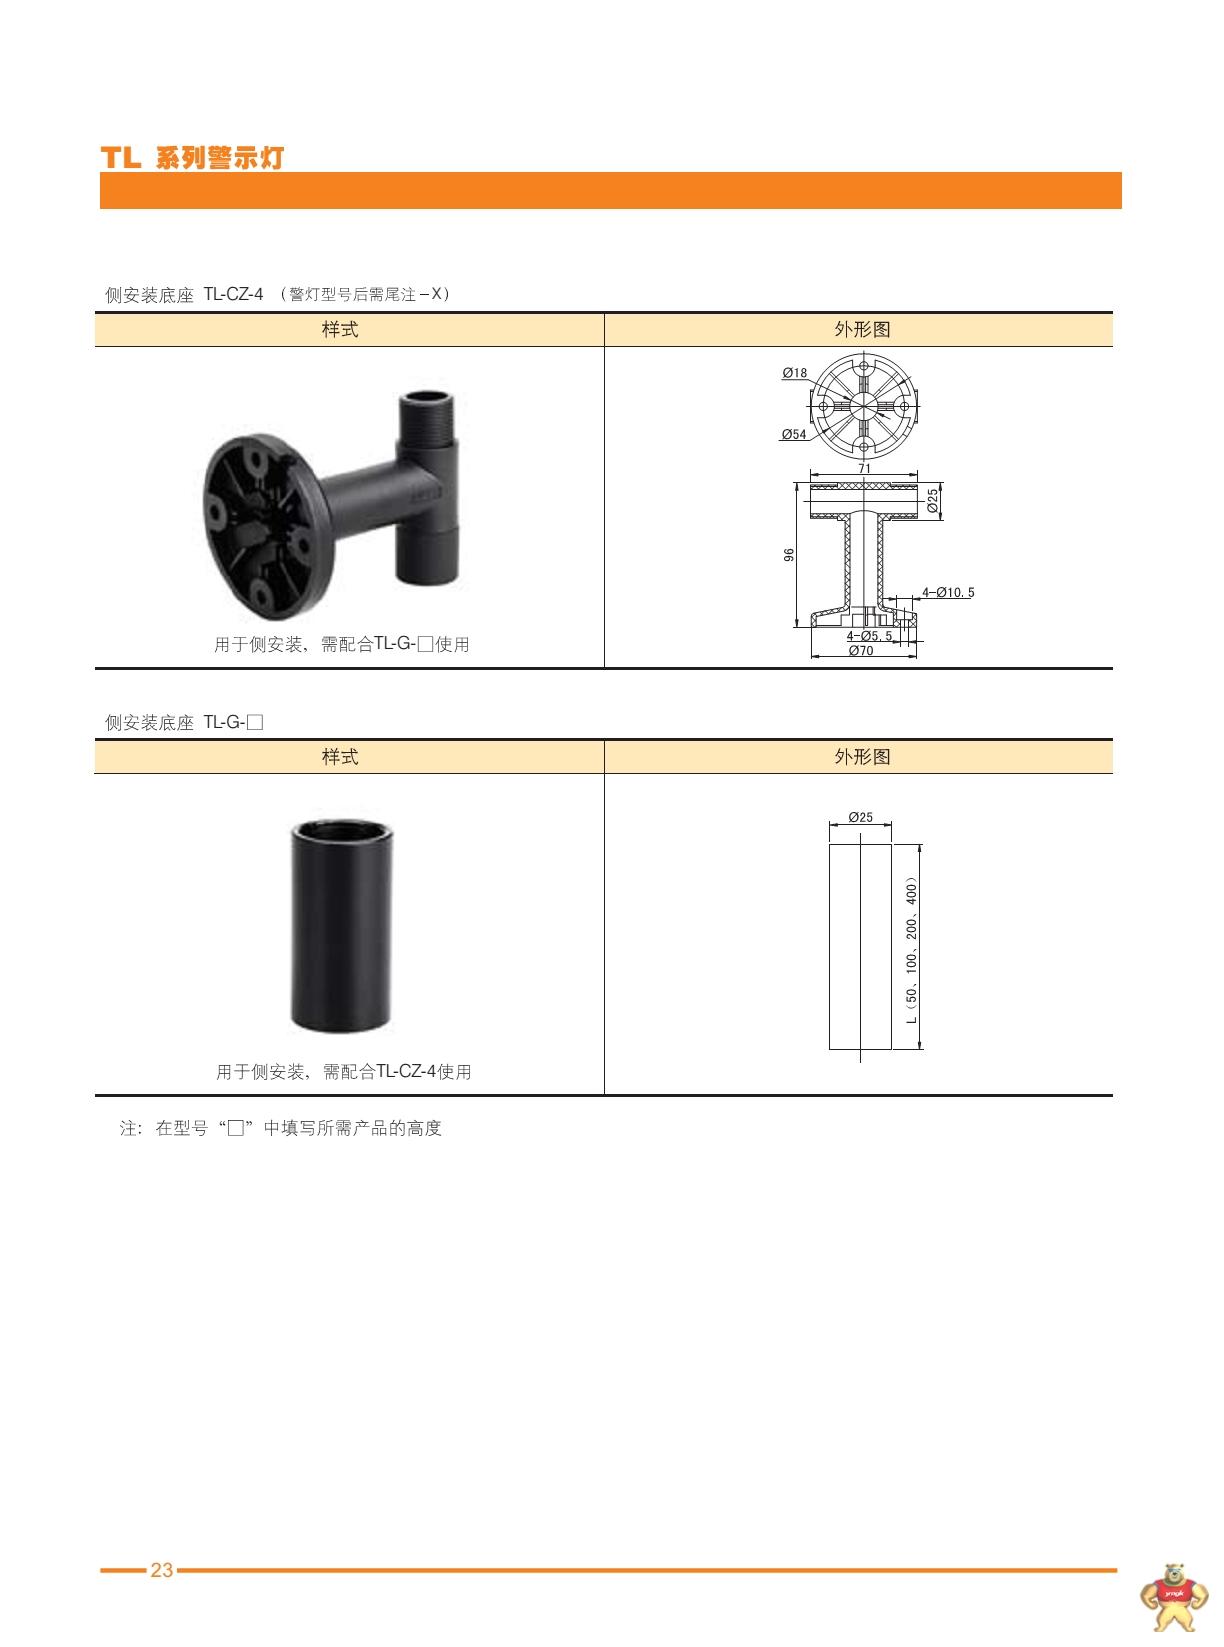 西门子apt警示灯 tl-90ls/bc/r31/s(d)